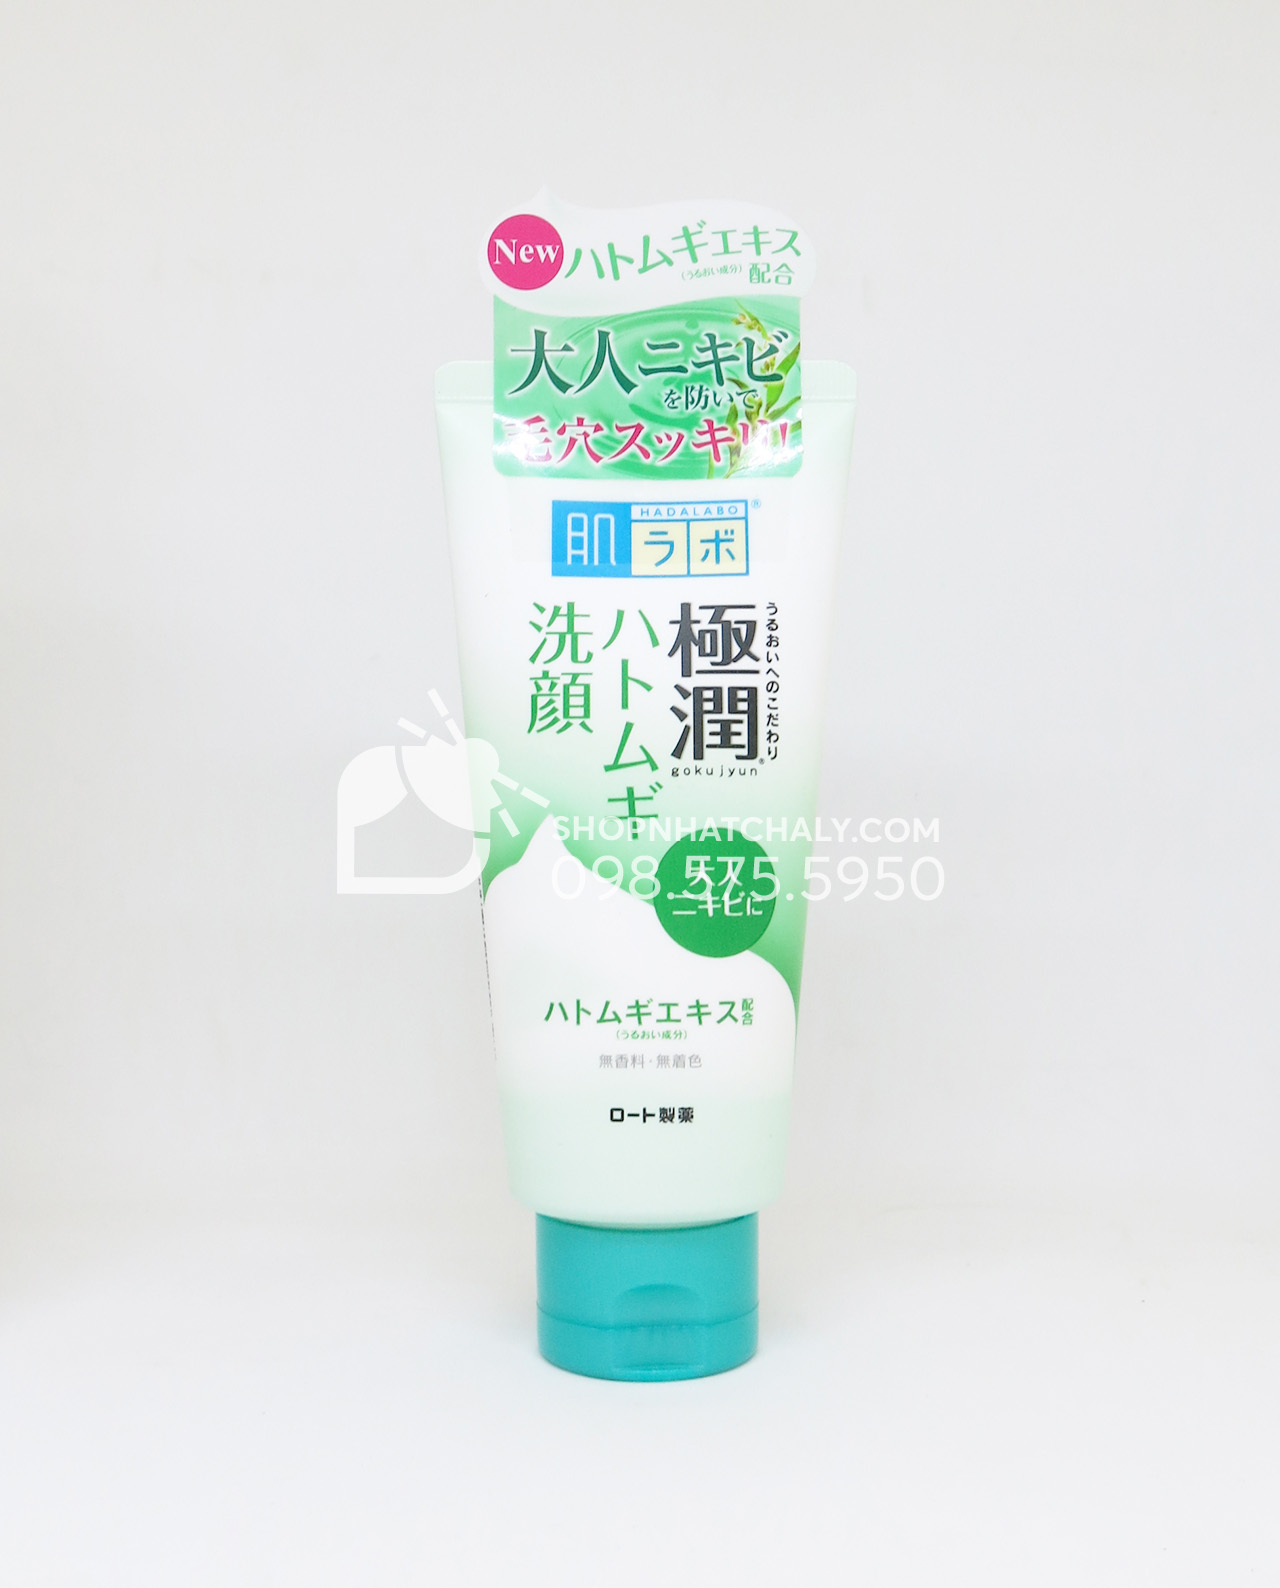 Sữa rửa mặt tạo bọt Hada Labo Gokujyun Foaming Cleanser tuýp 100gr cho da dầu da mụn